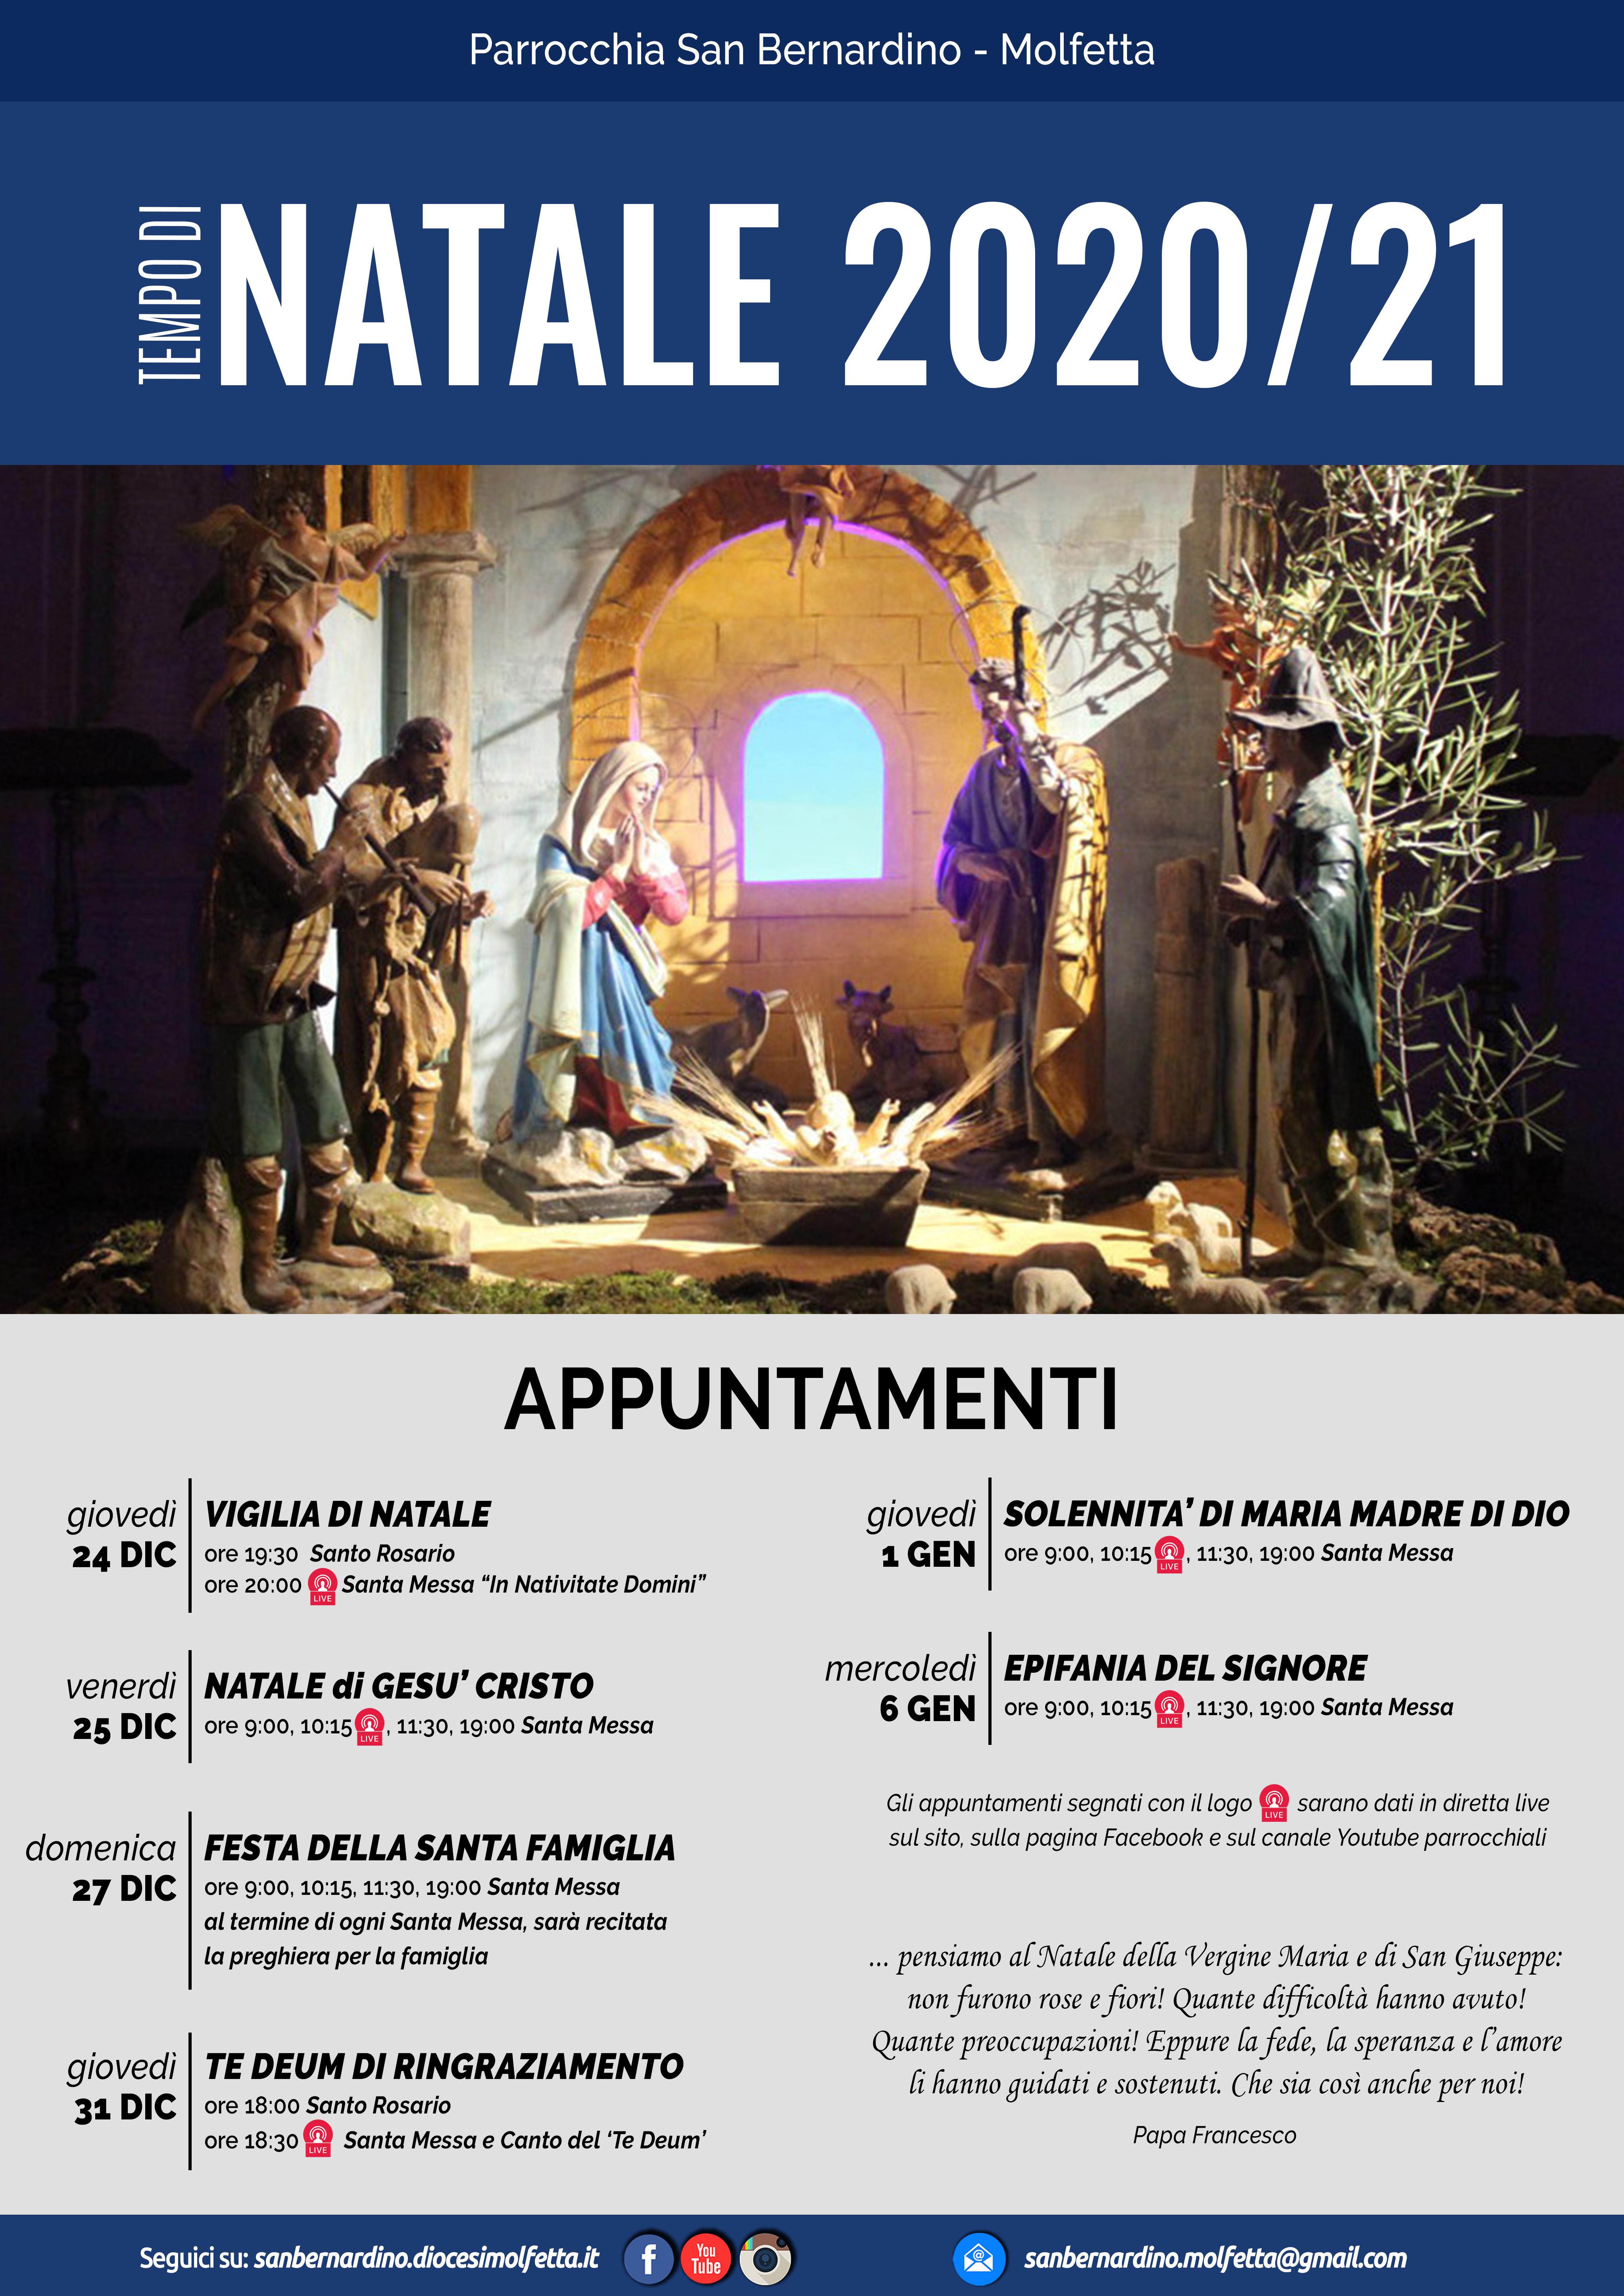 parrocchia san bernardino molfetta natale avvento appuntamenti messe dirette 2020 2021